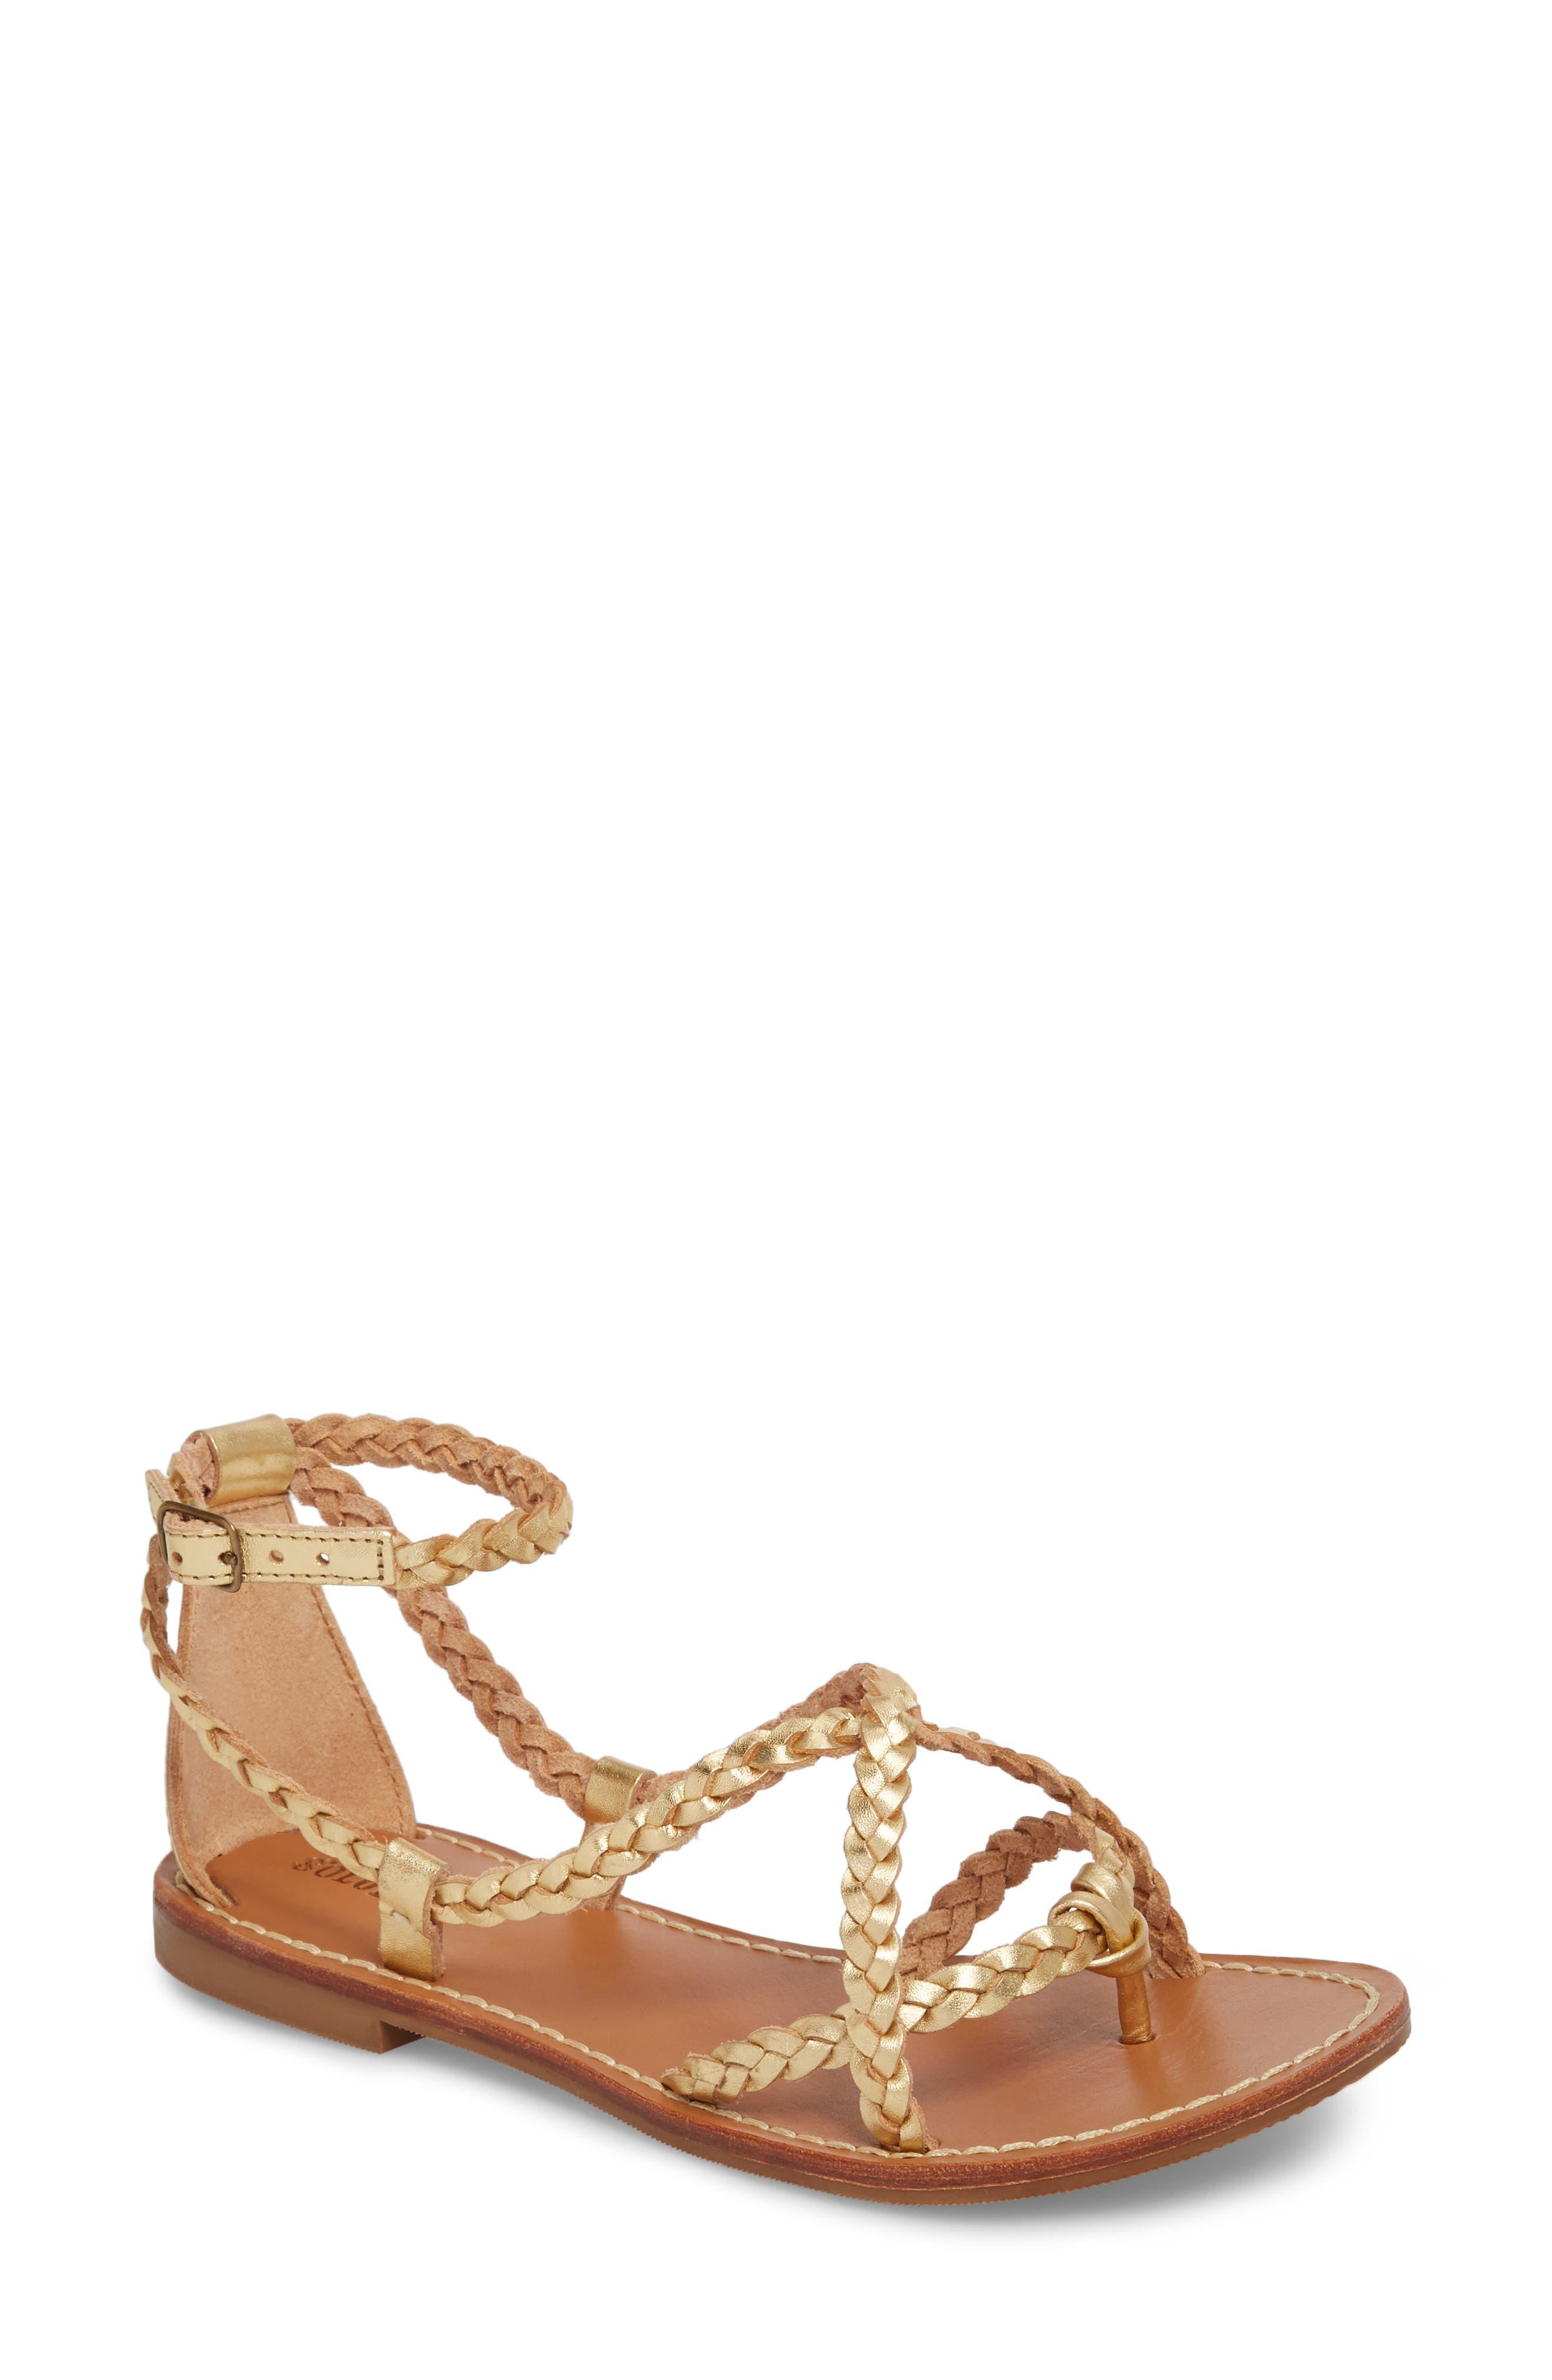 Amalfi Braided Metallic Sandal,                             Main thumbnail 1, color,                             710